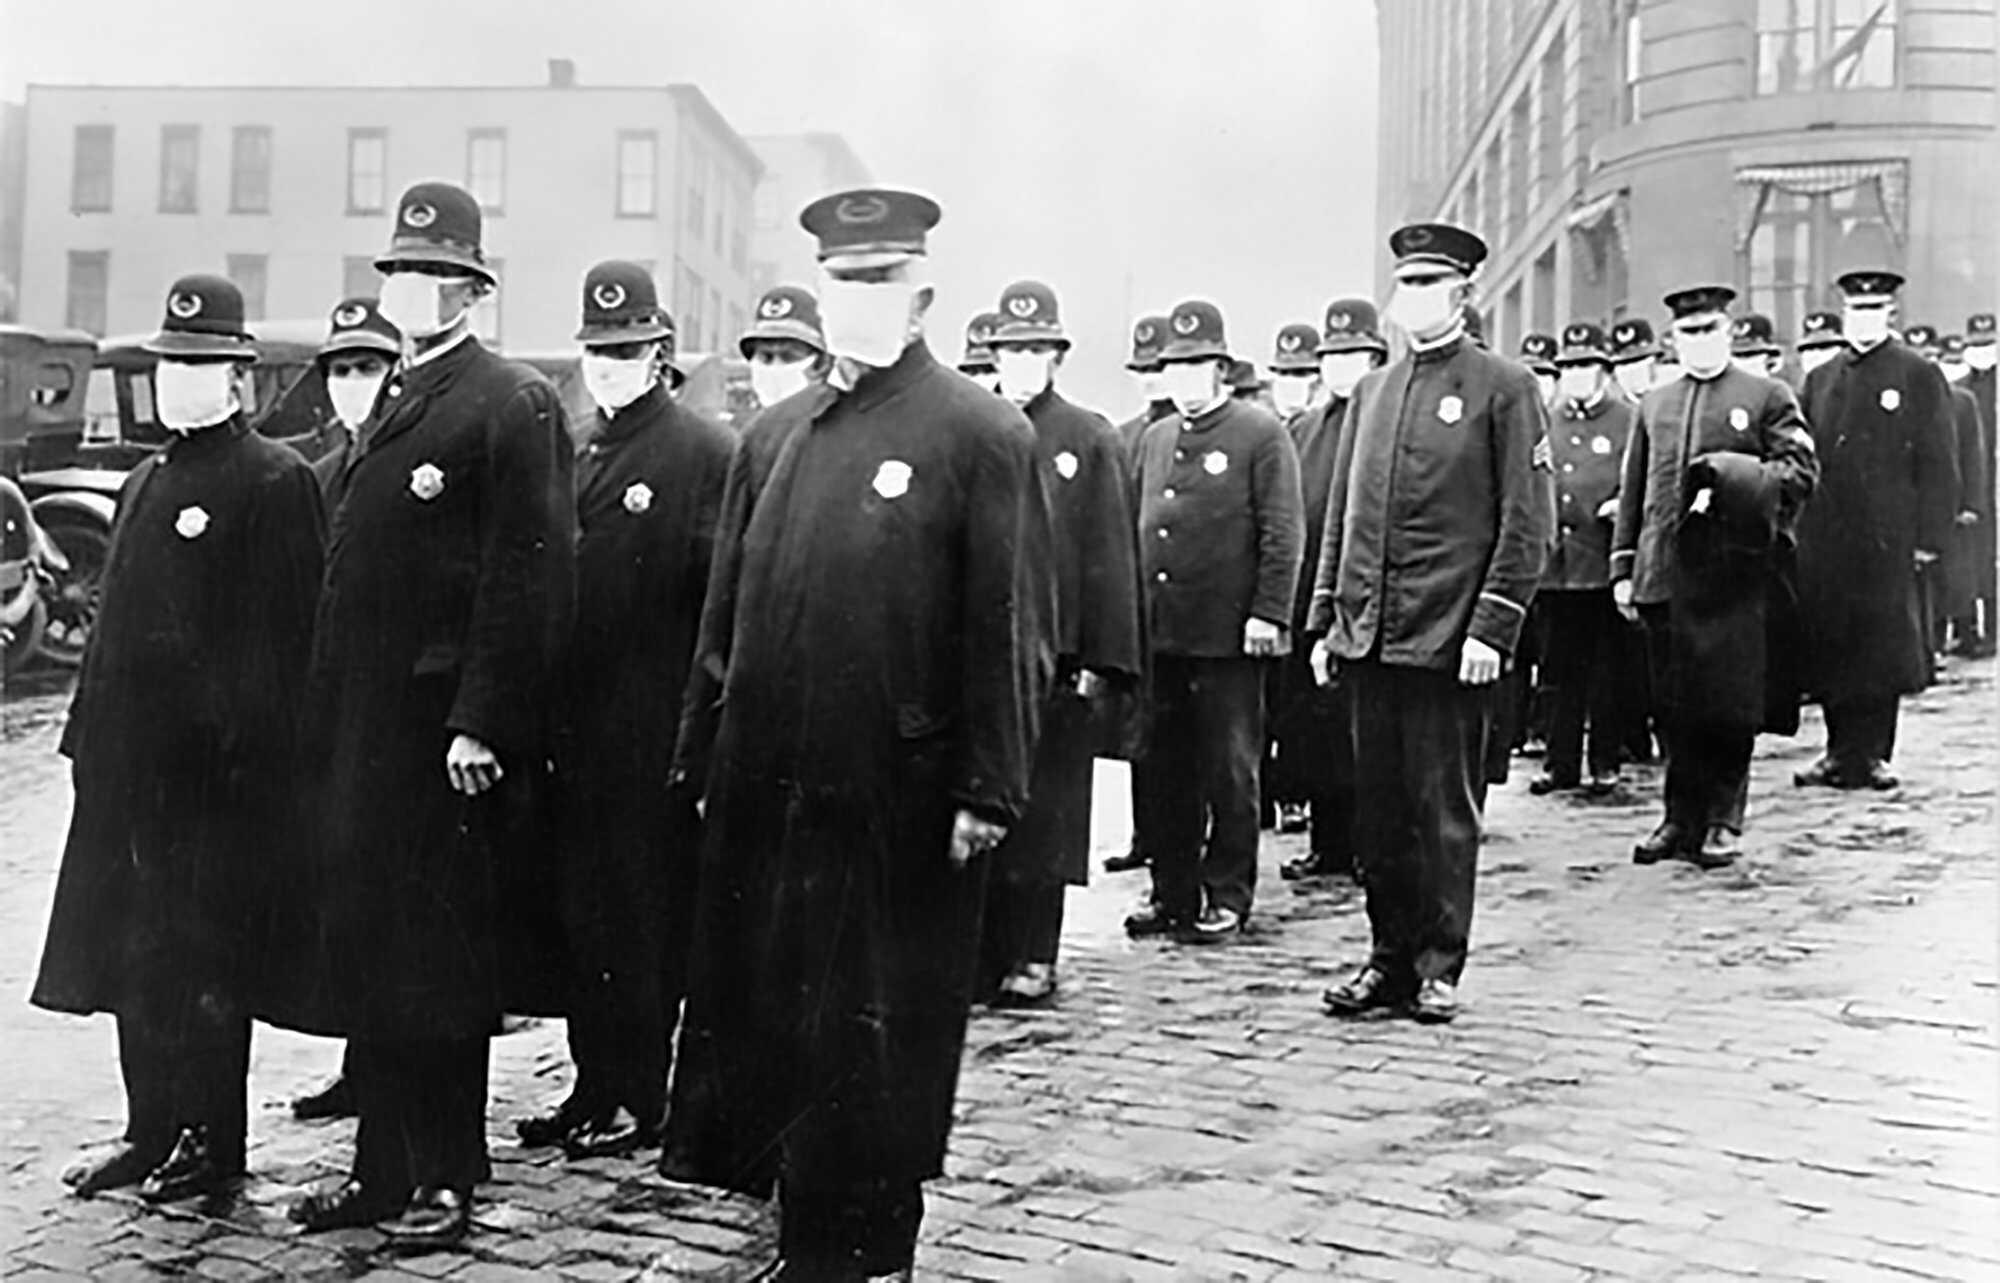 Influenza-Blue-Seattle-Police-1918-NARA.jpg